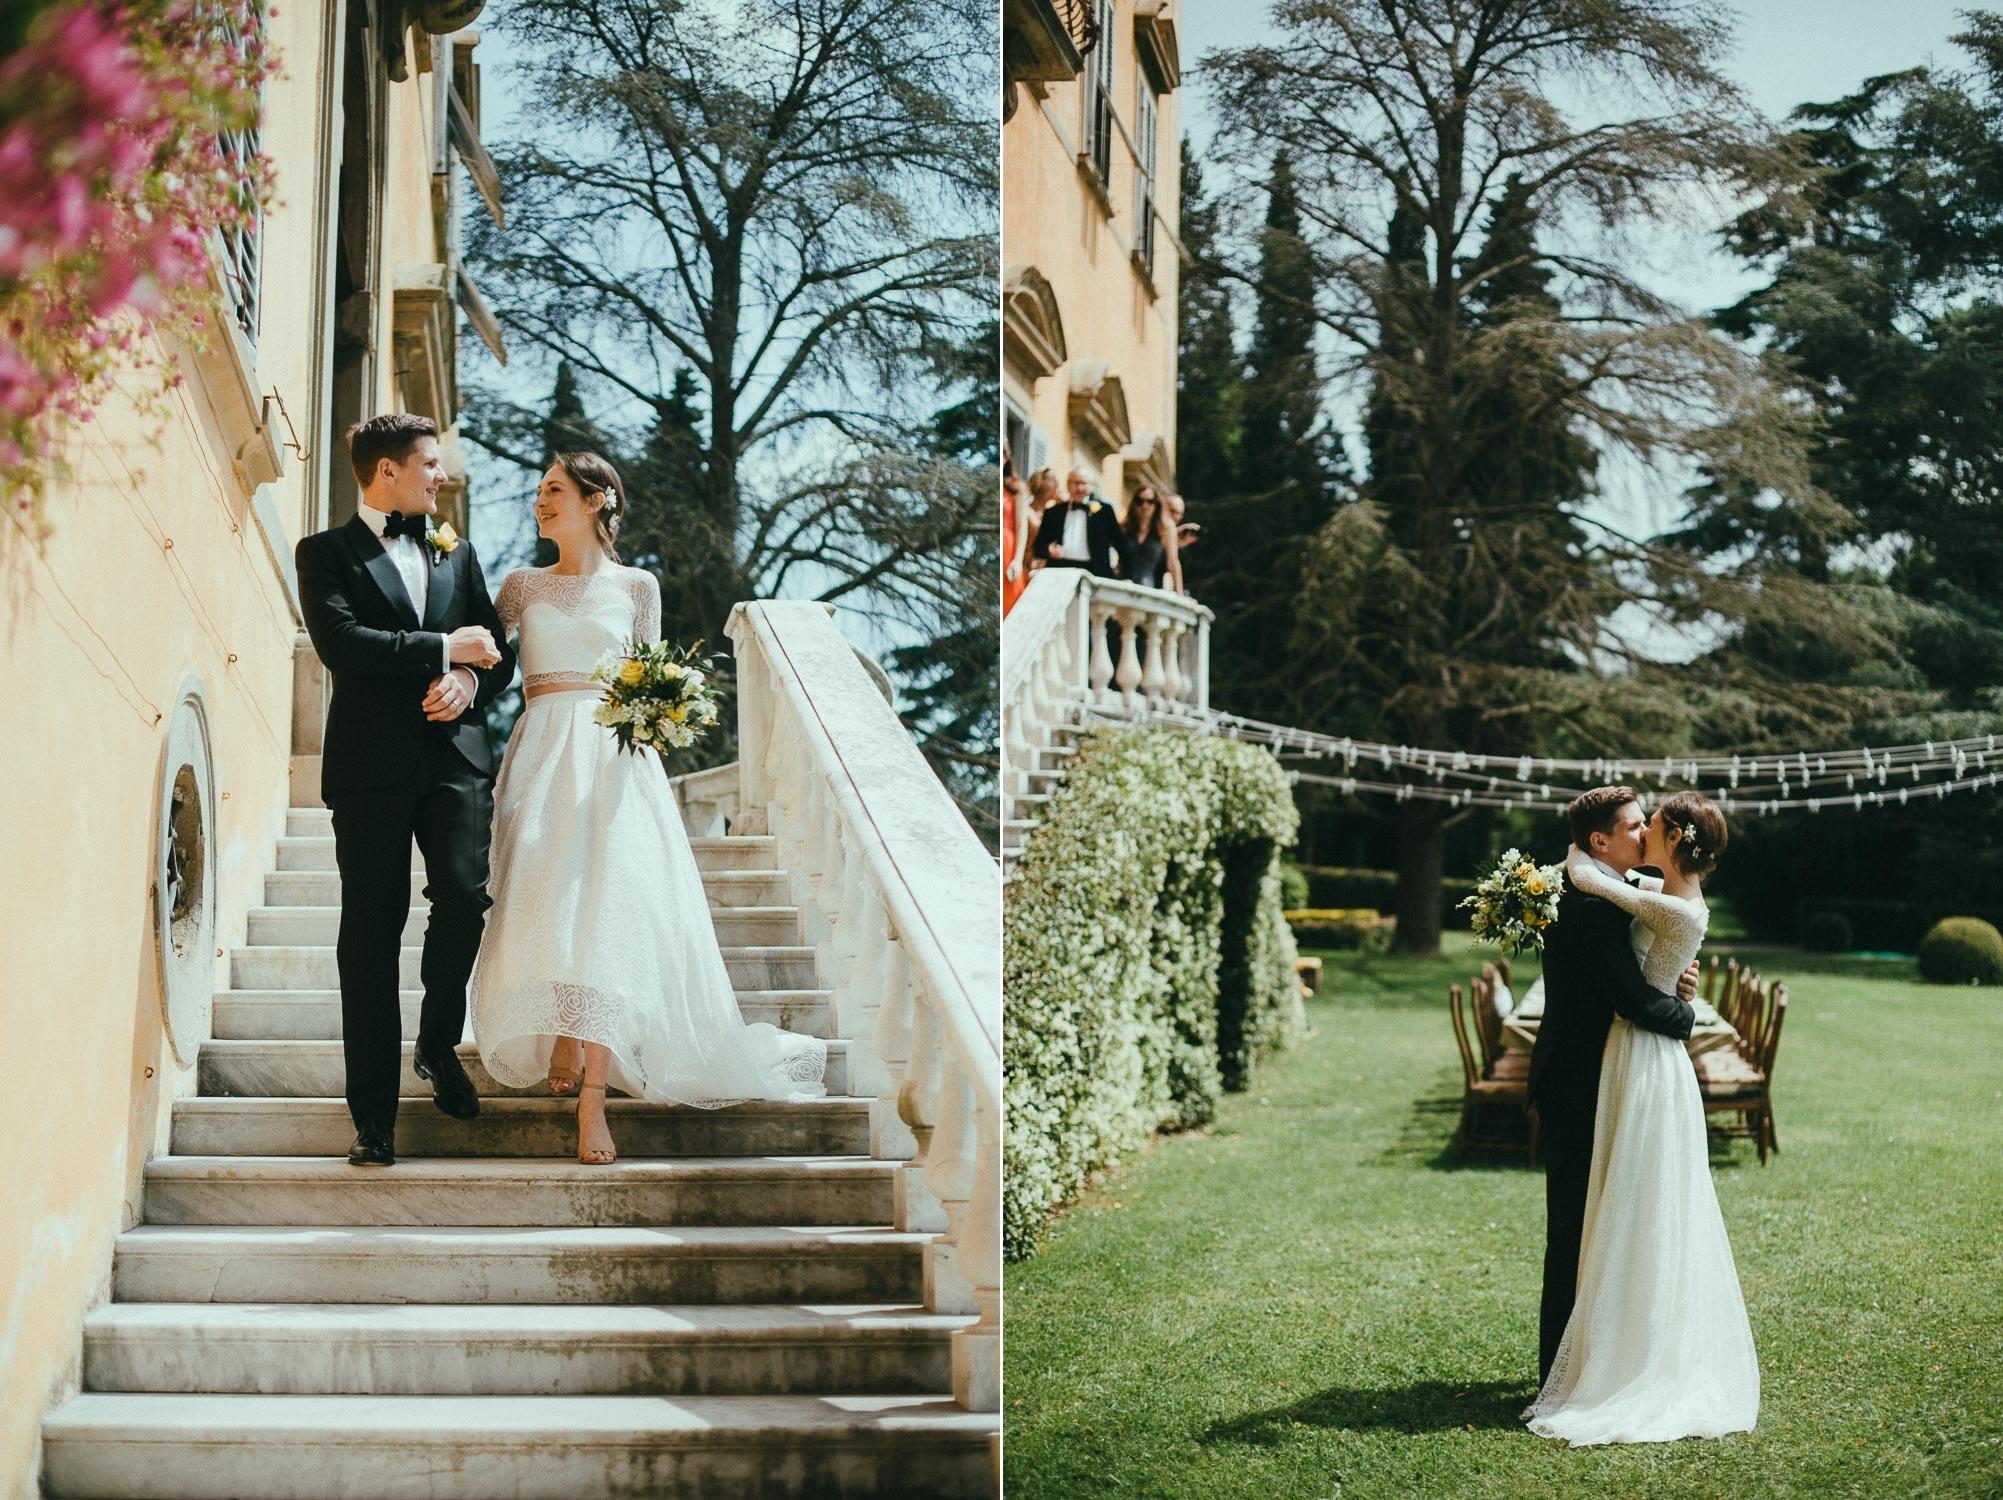 59-bride-groom-outside-villa.jpg